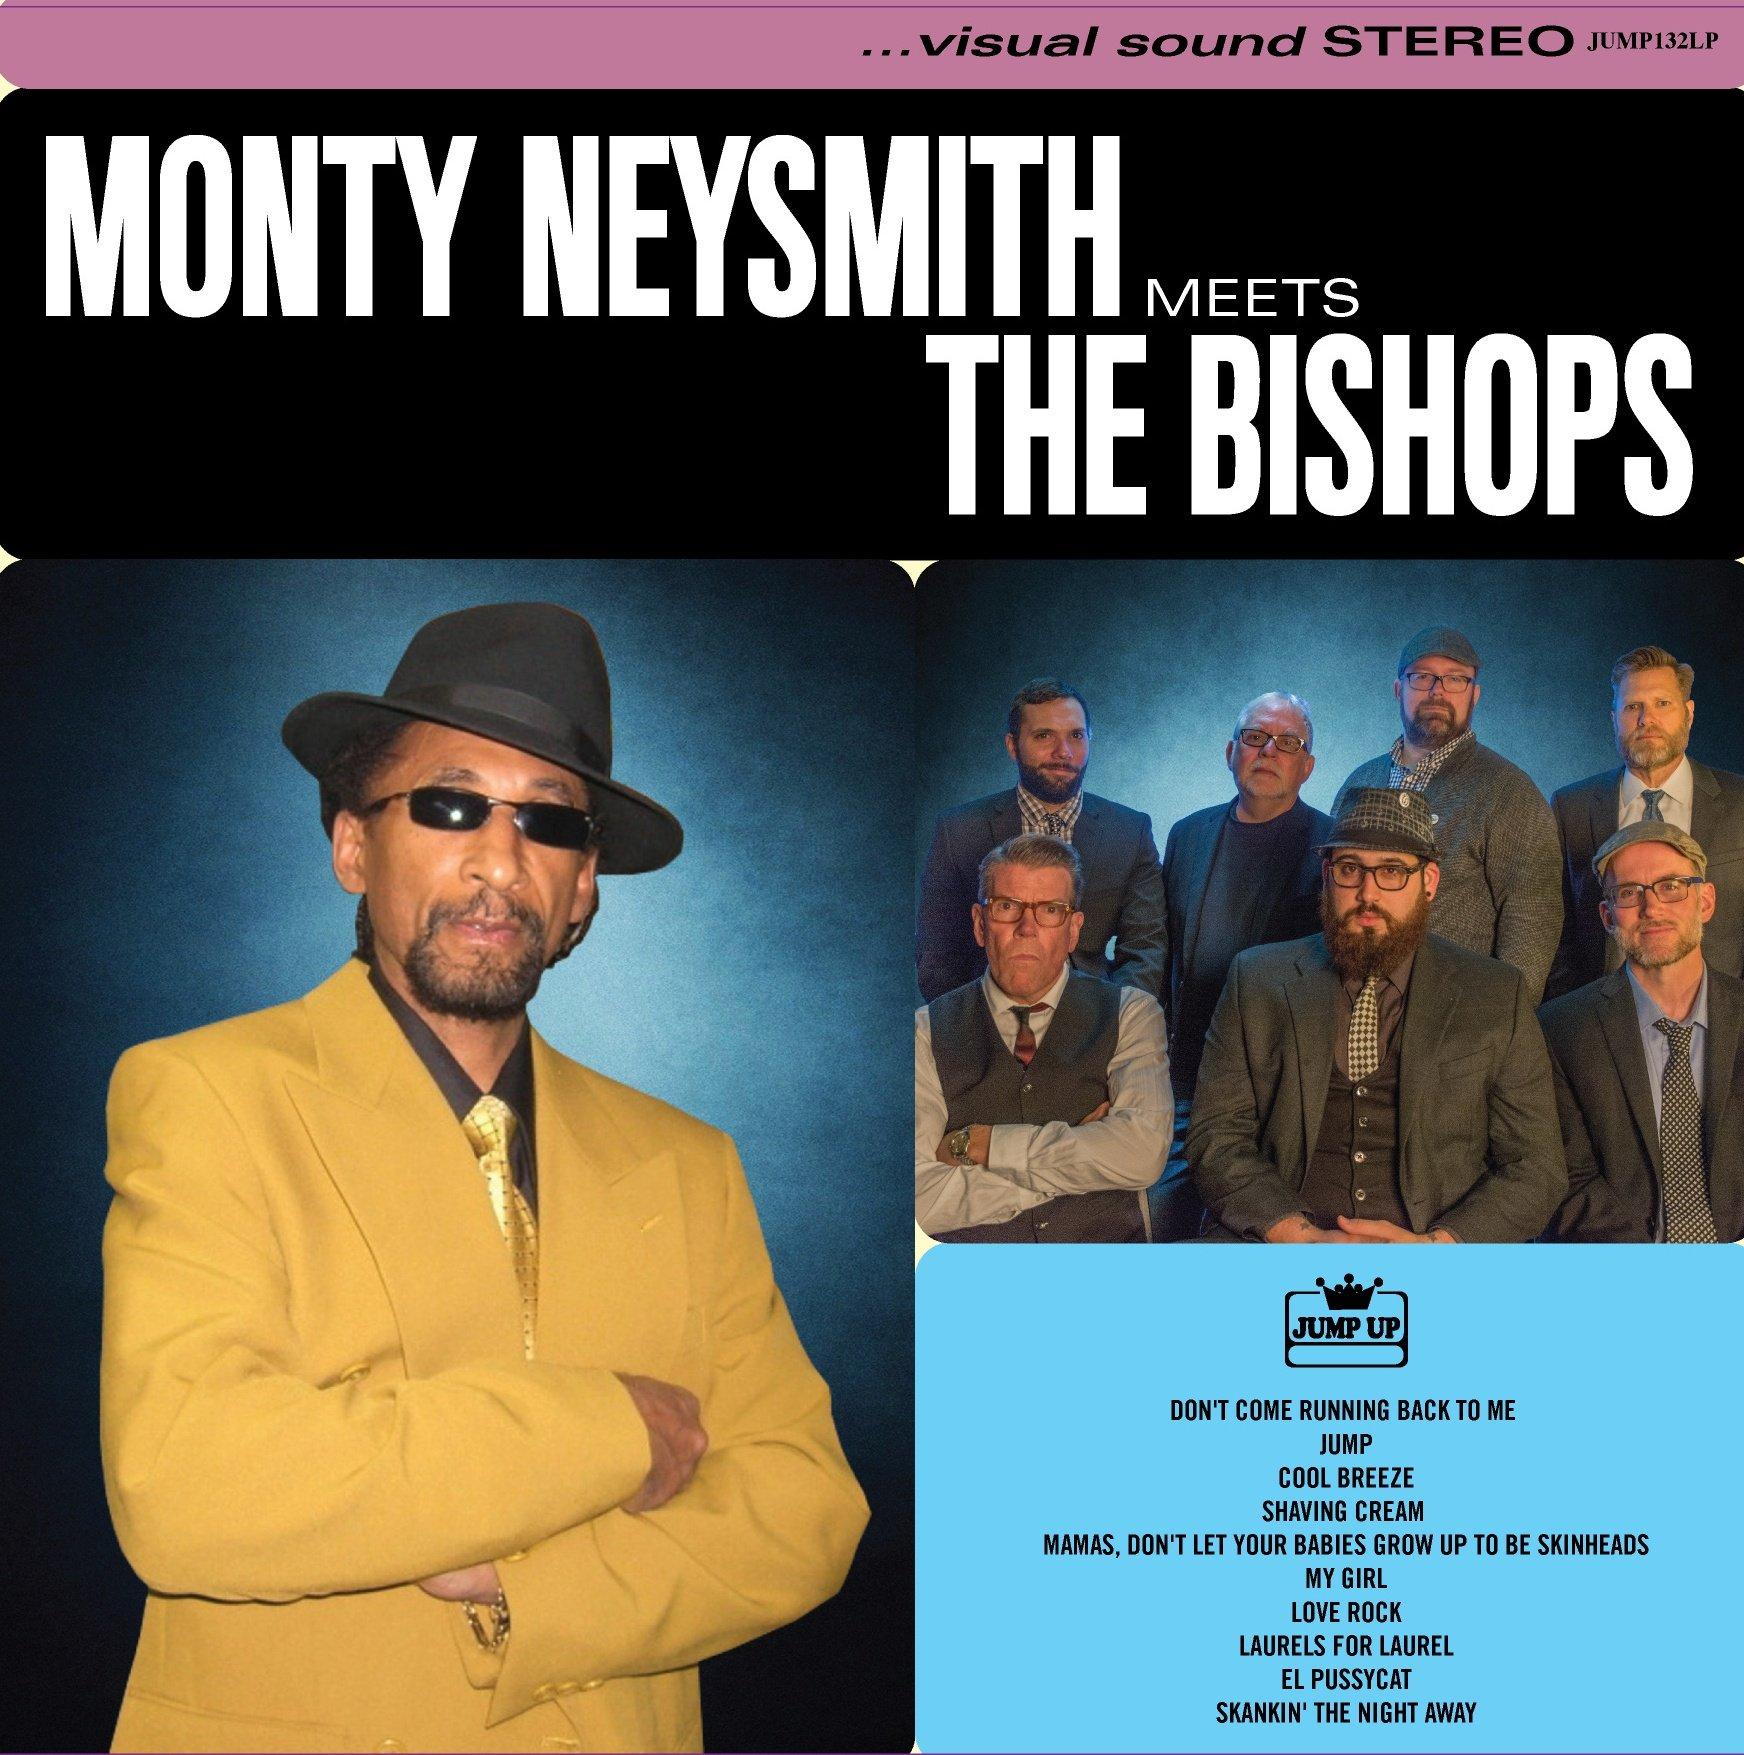 Vinilo : Monty Neysmith - Meets The Bishops (LP Vinyl)